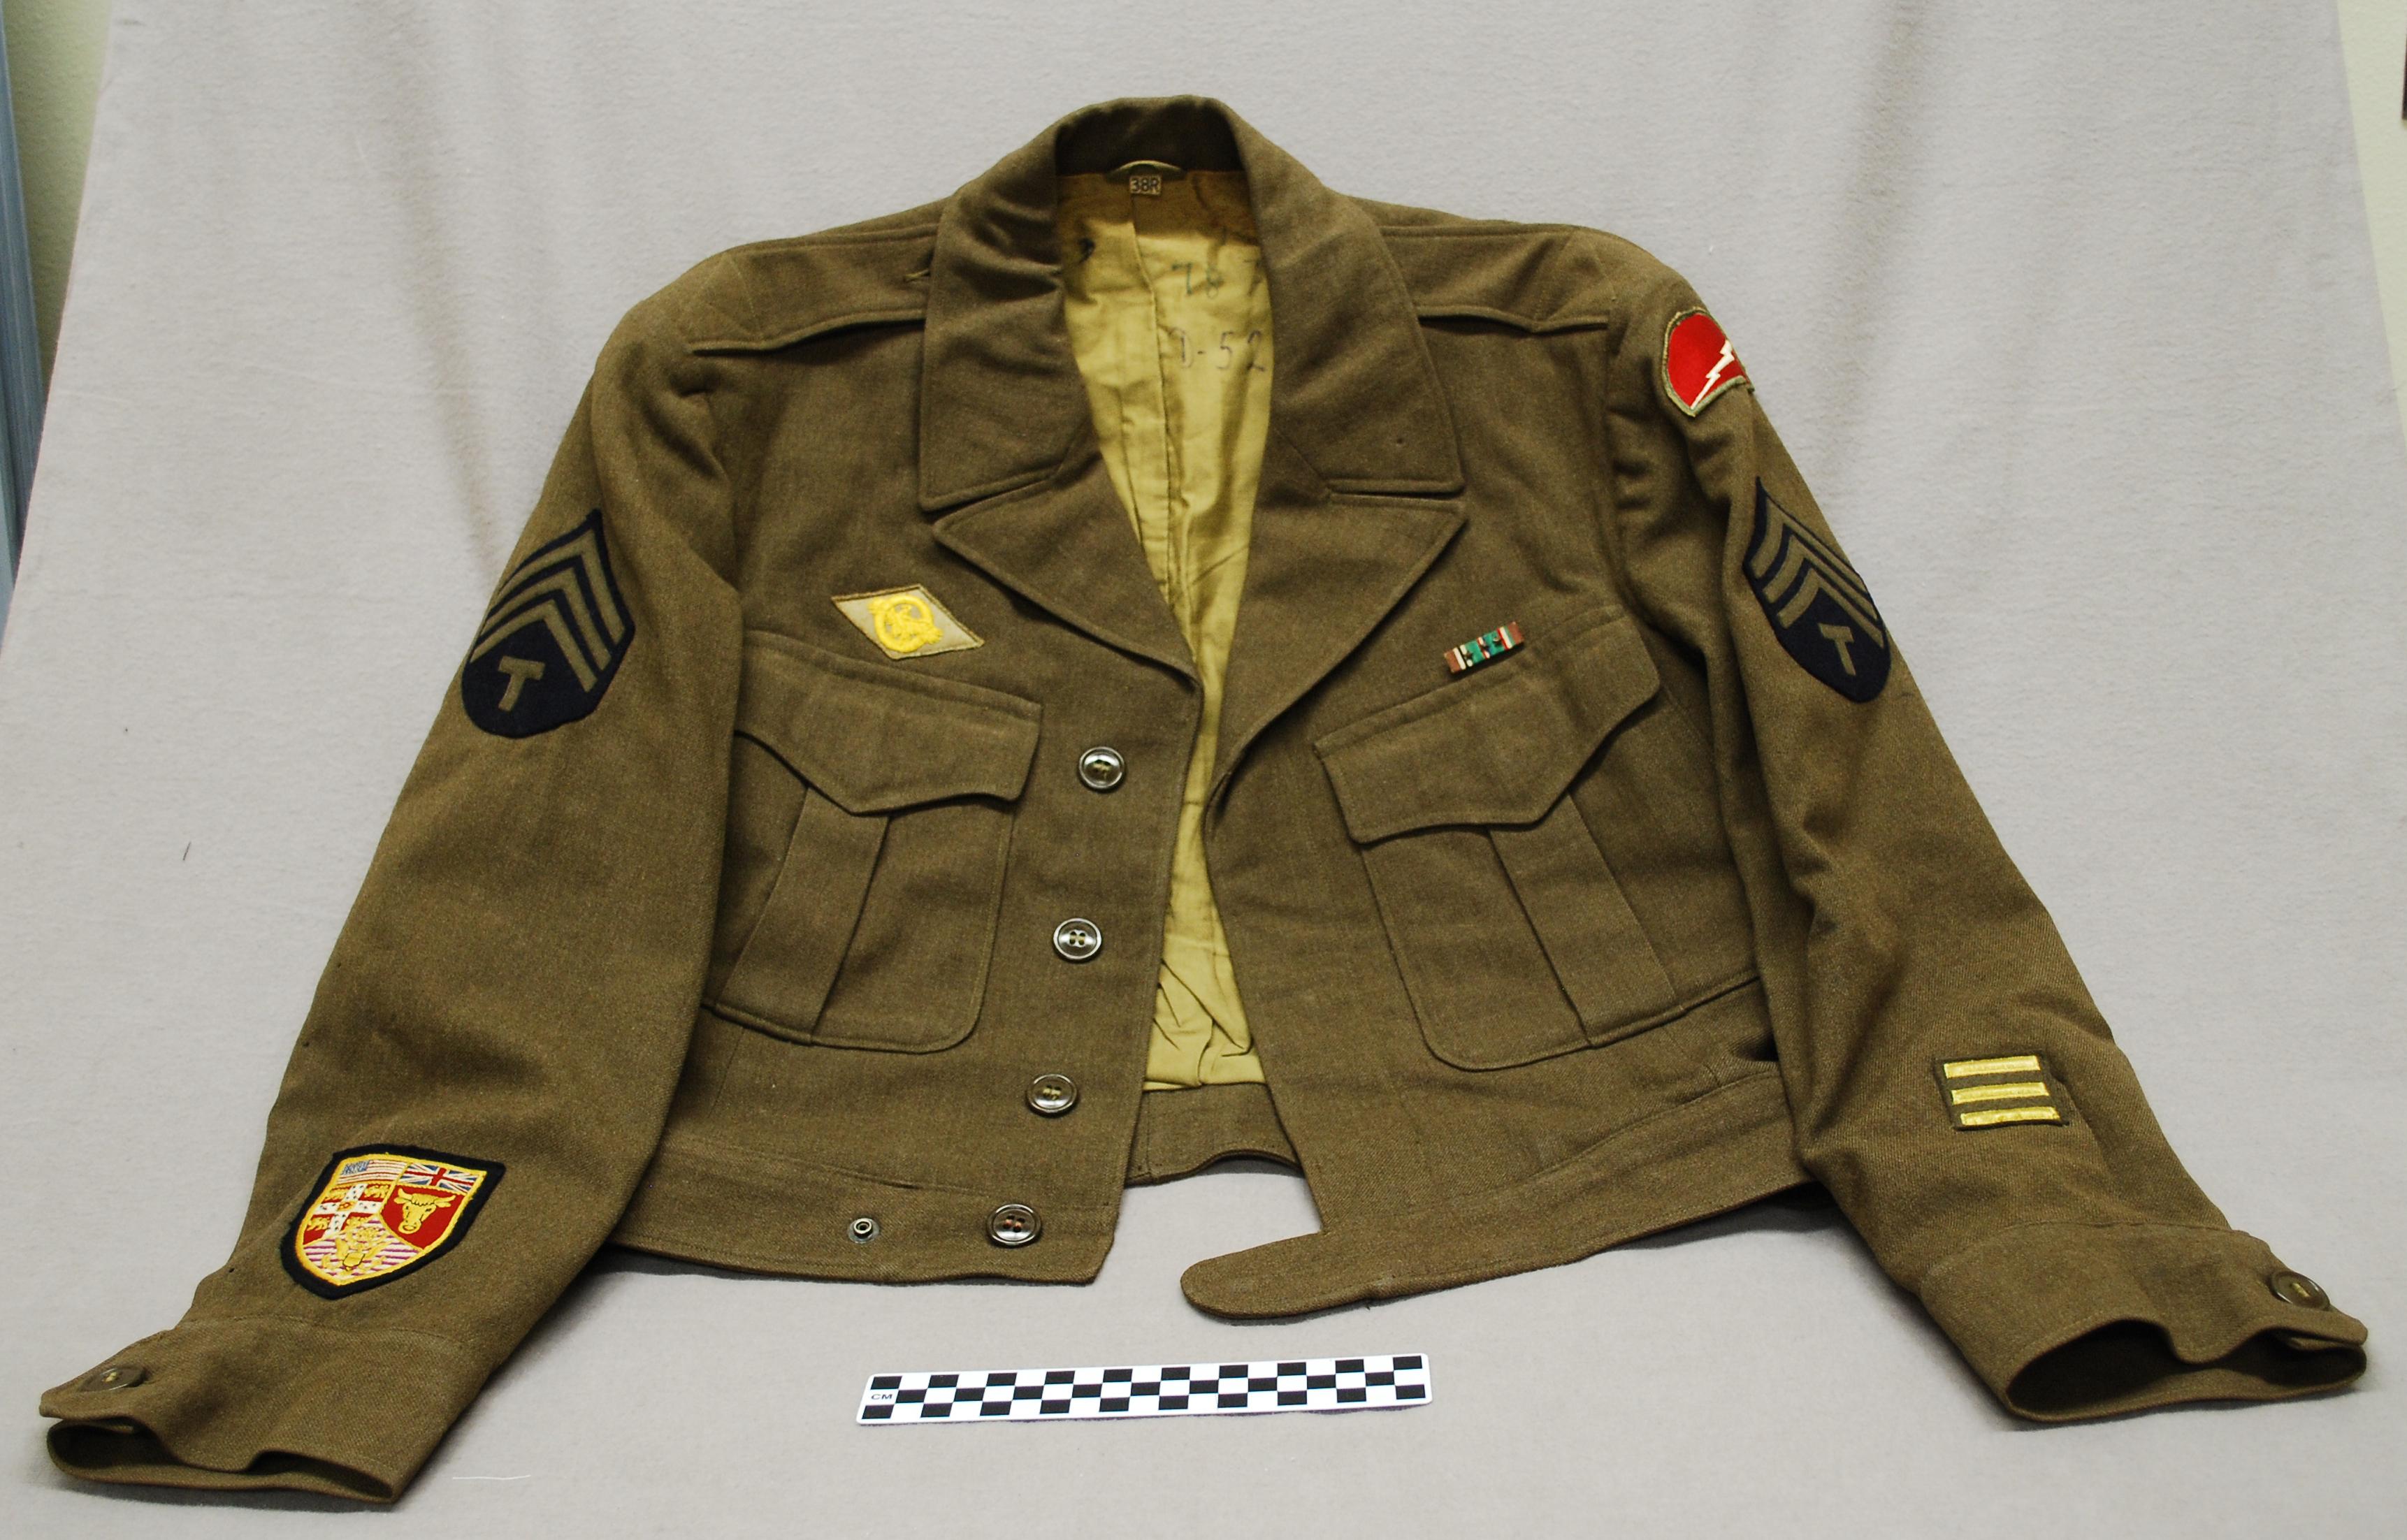 Object: Uniform (United States Army Uniform (World War II)) | UTSA Institute Of Texan Cultures